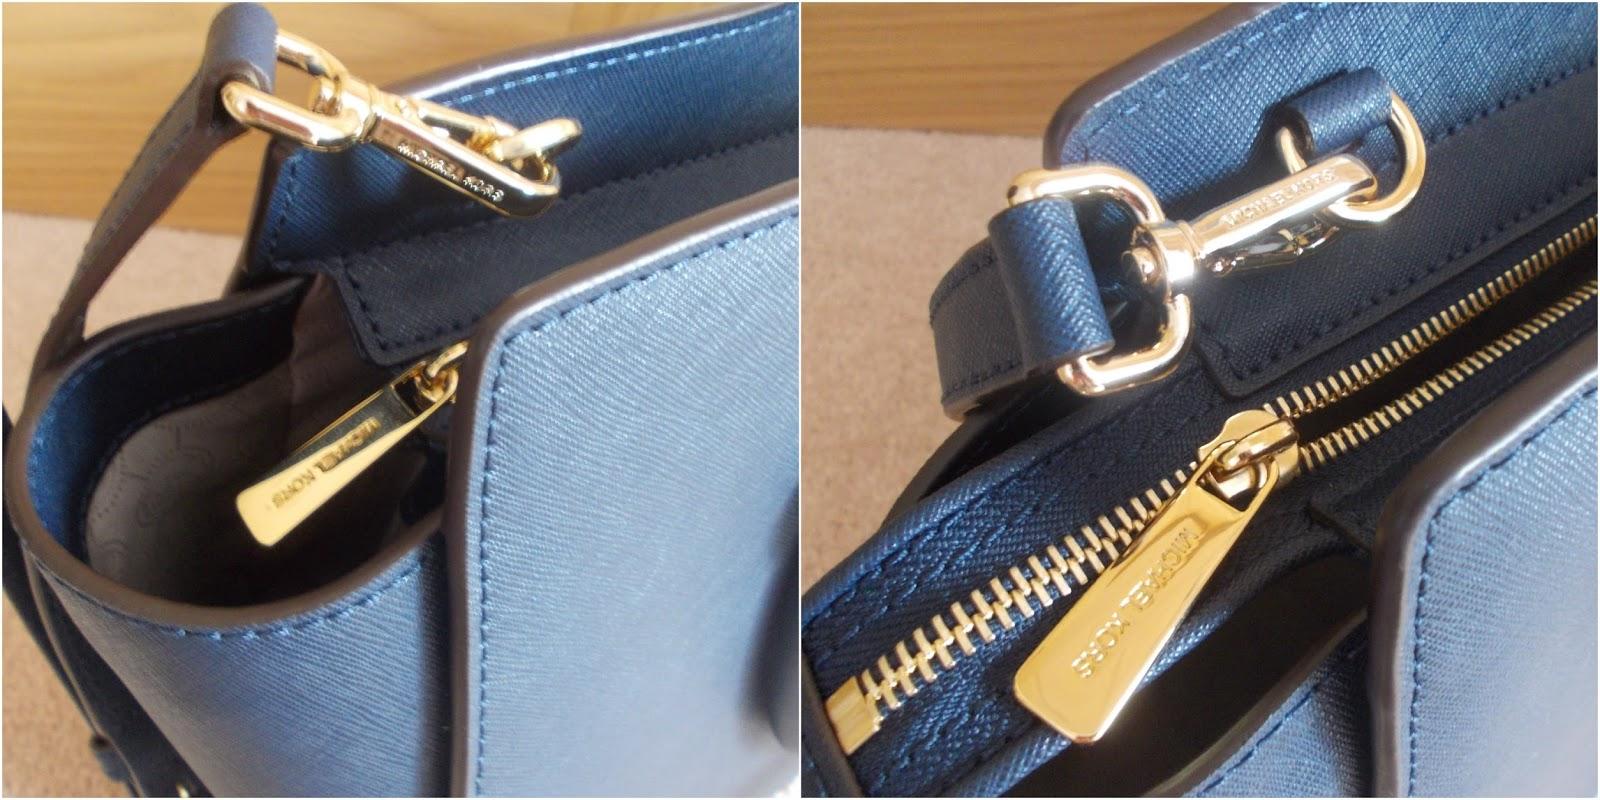 Discount Michael Kors Bags Uk Handbag Michael Kors Outlet Michael ... bebc62f1ed